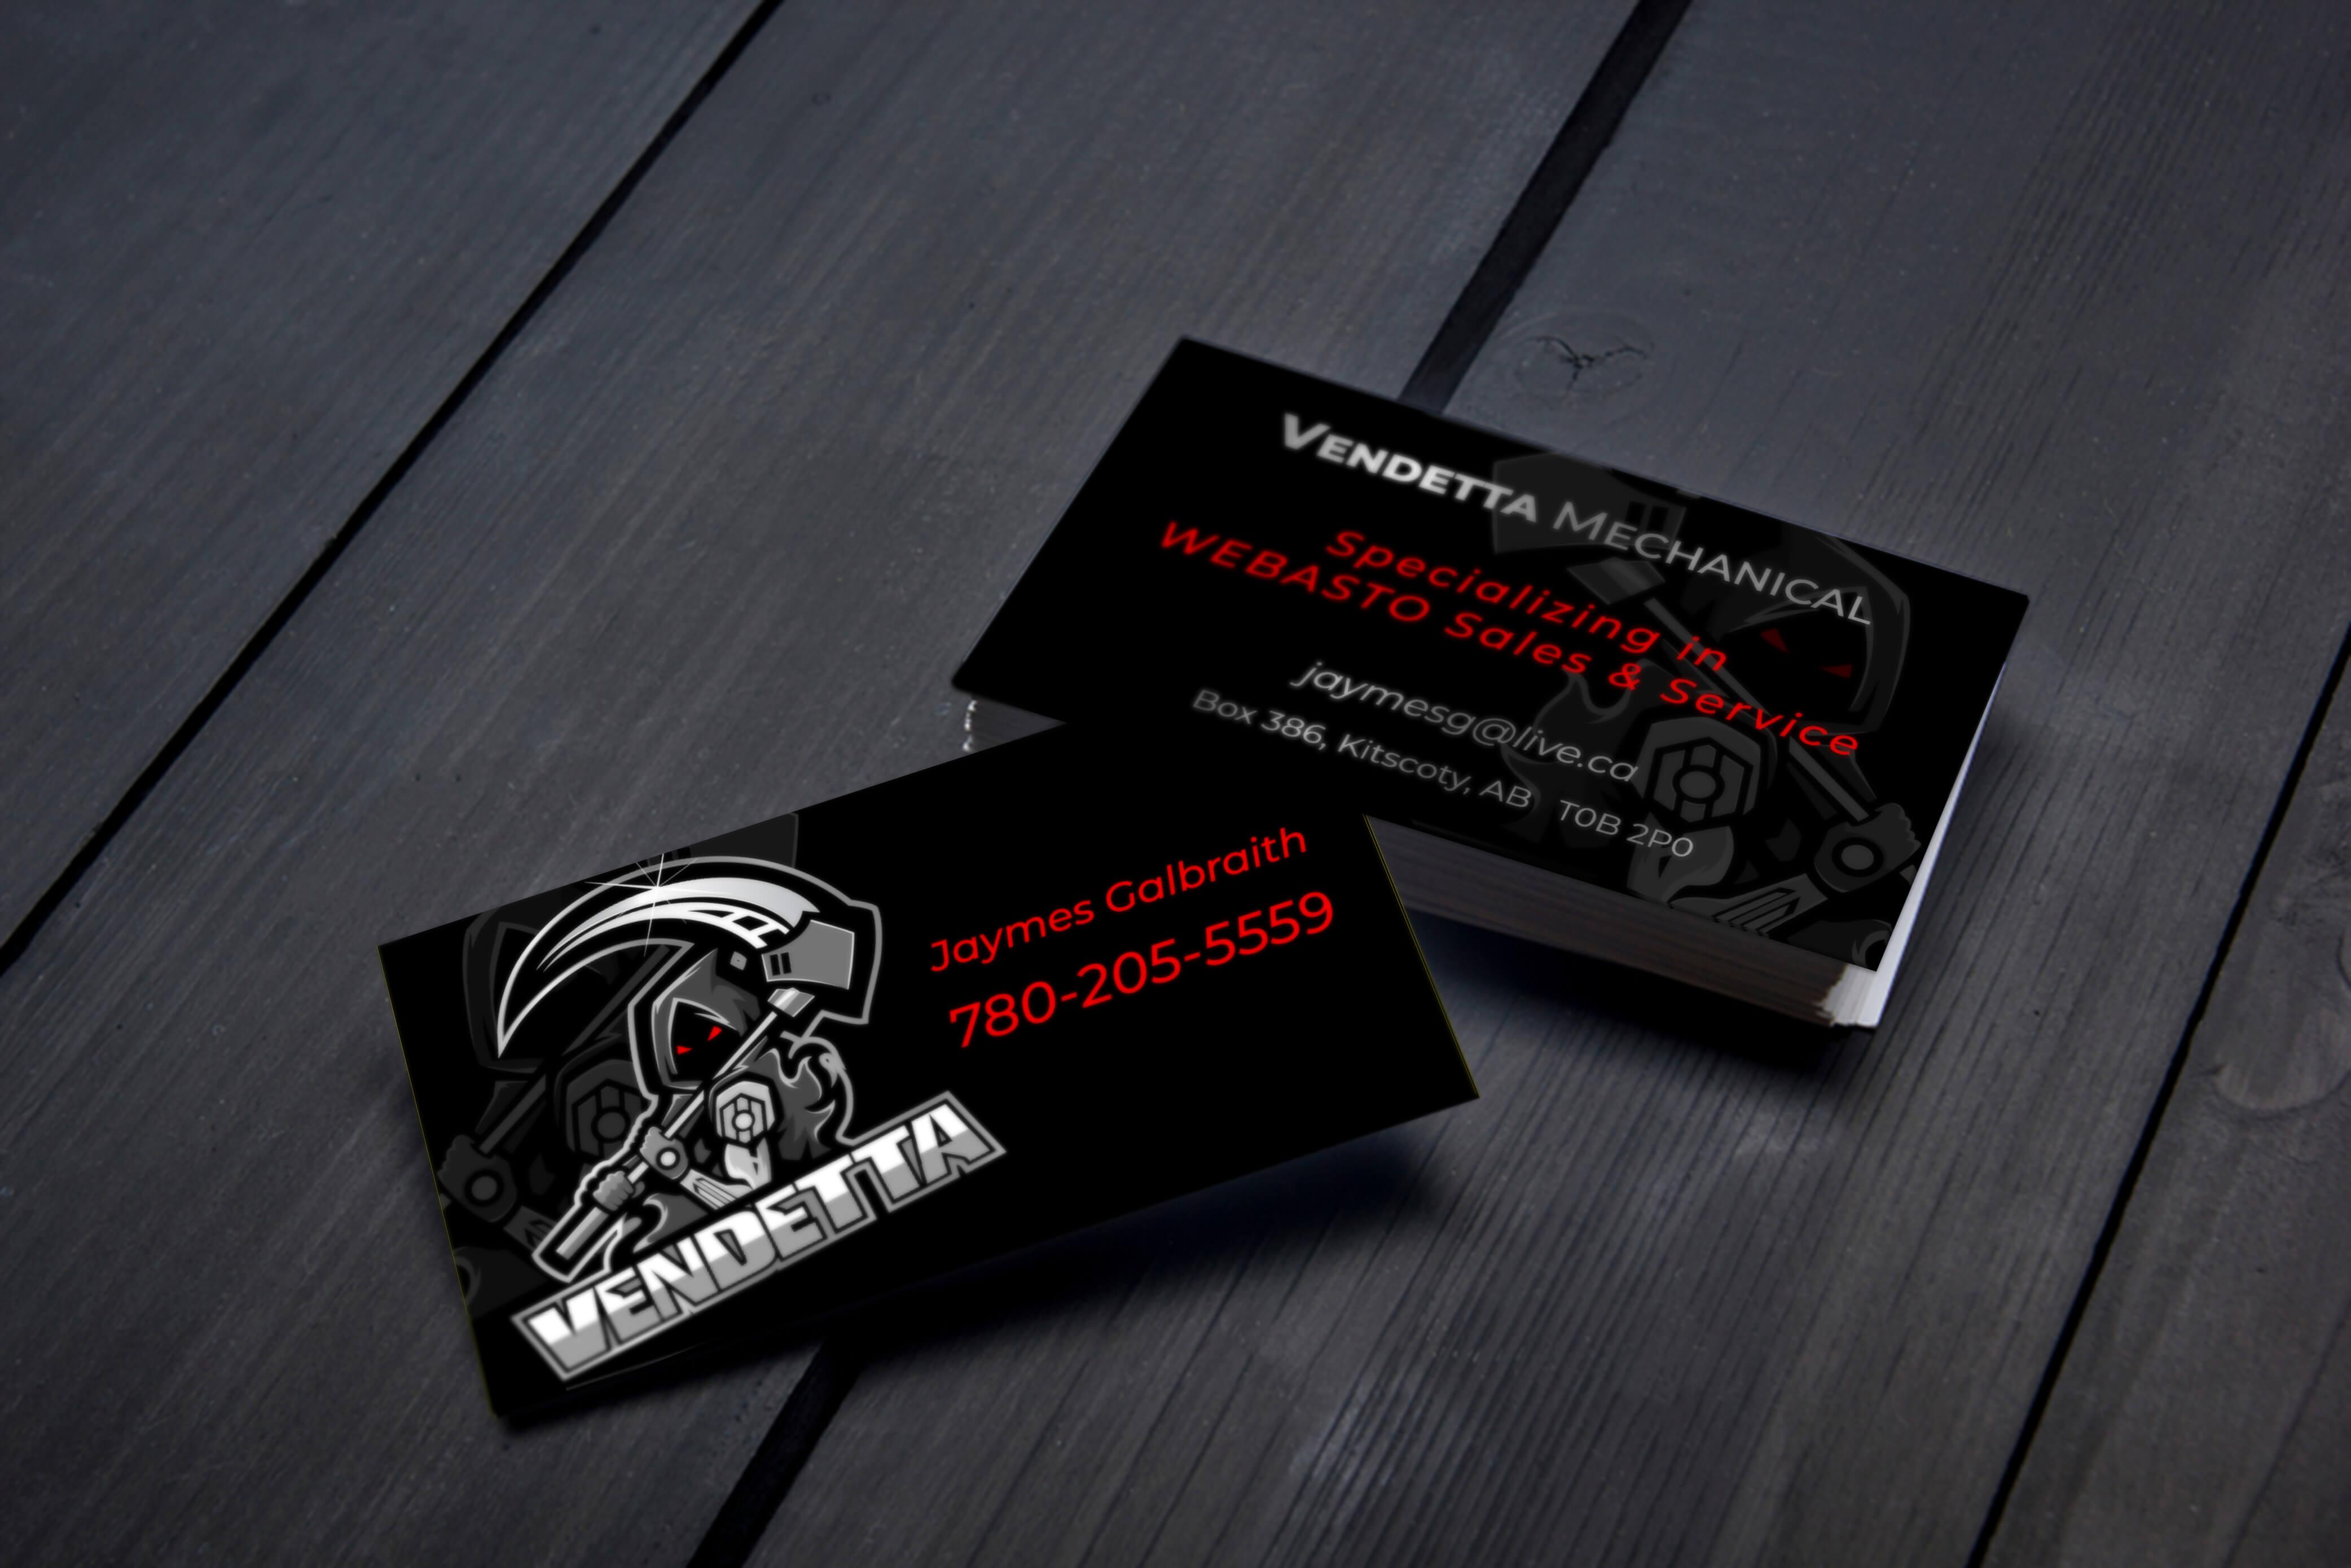 Vendetta Mechanical Business Cards